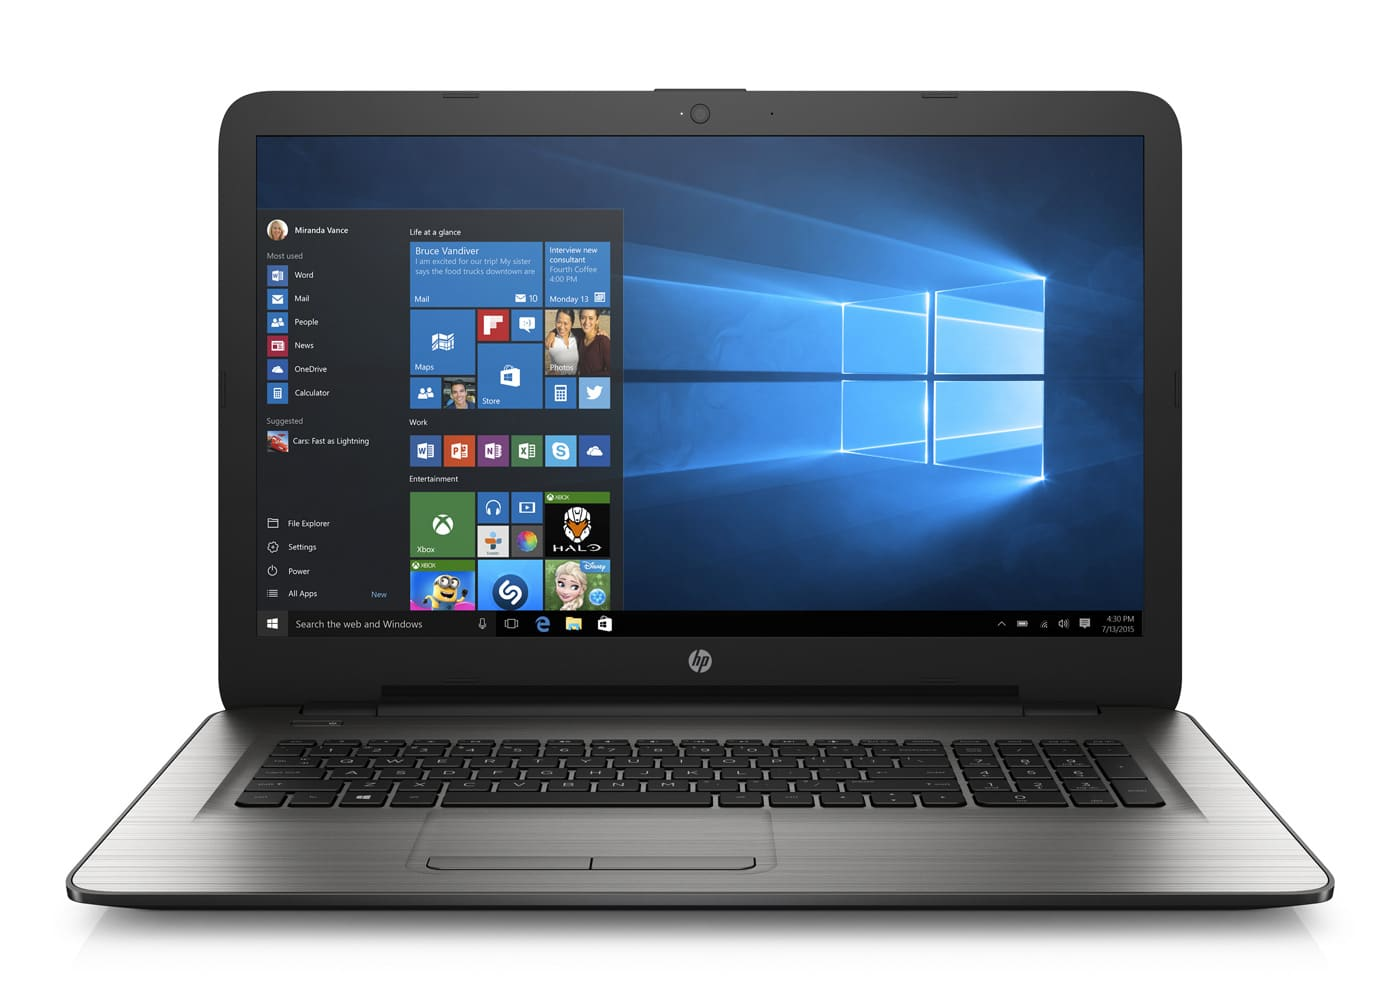 HP 17-x114nf à 519€, PC portable 17 pouces Core i5 Kaby Lake et 1 To argent